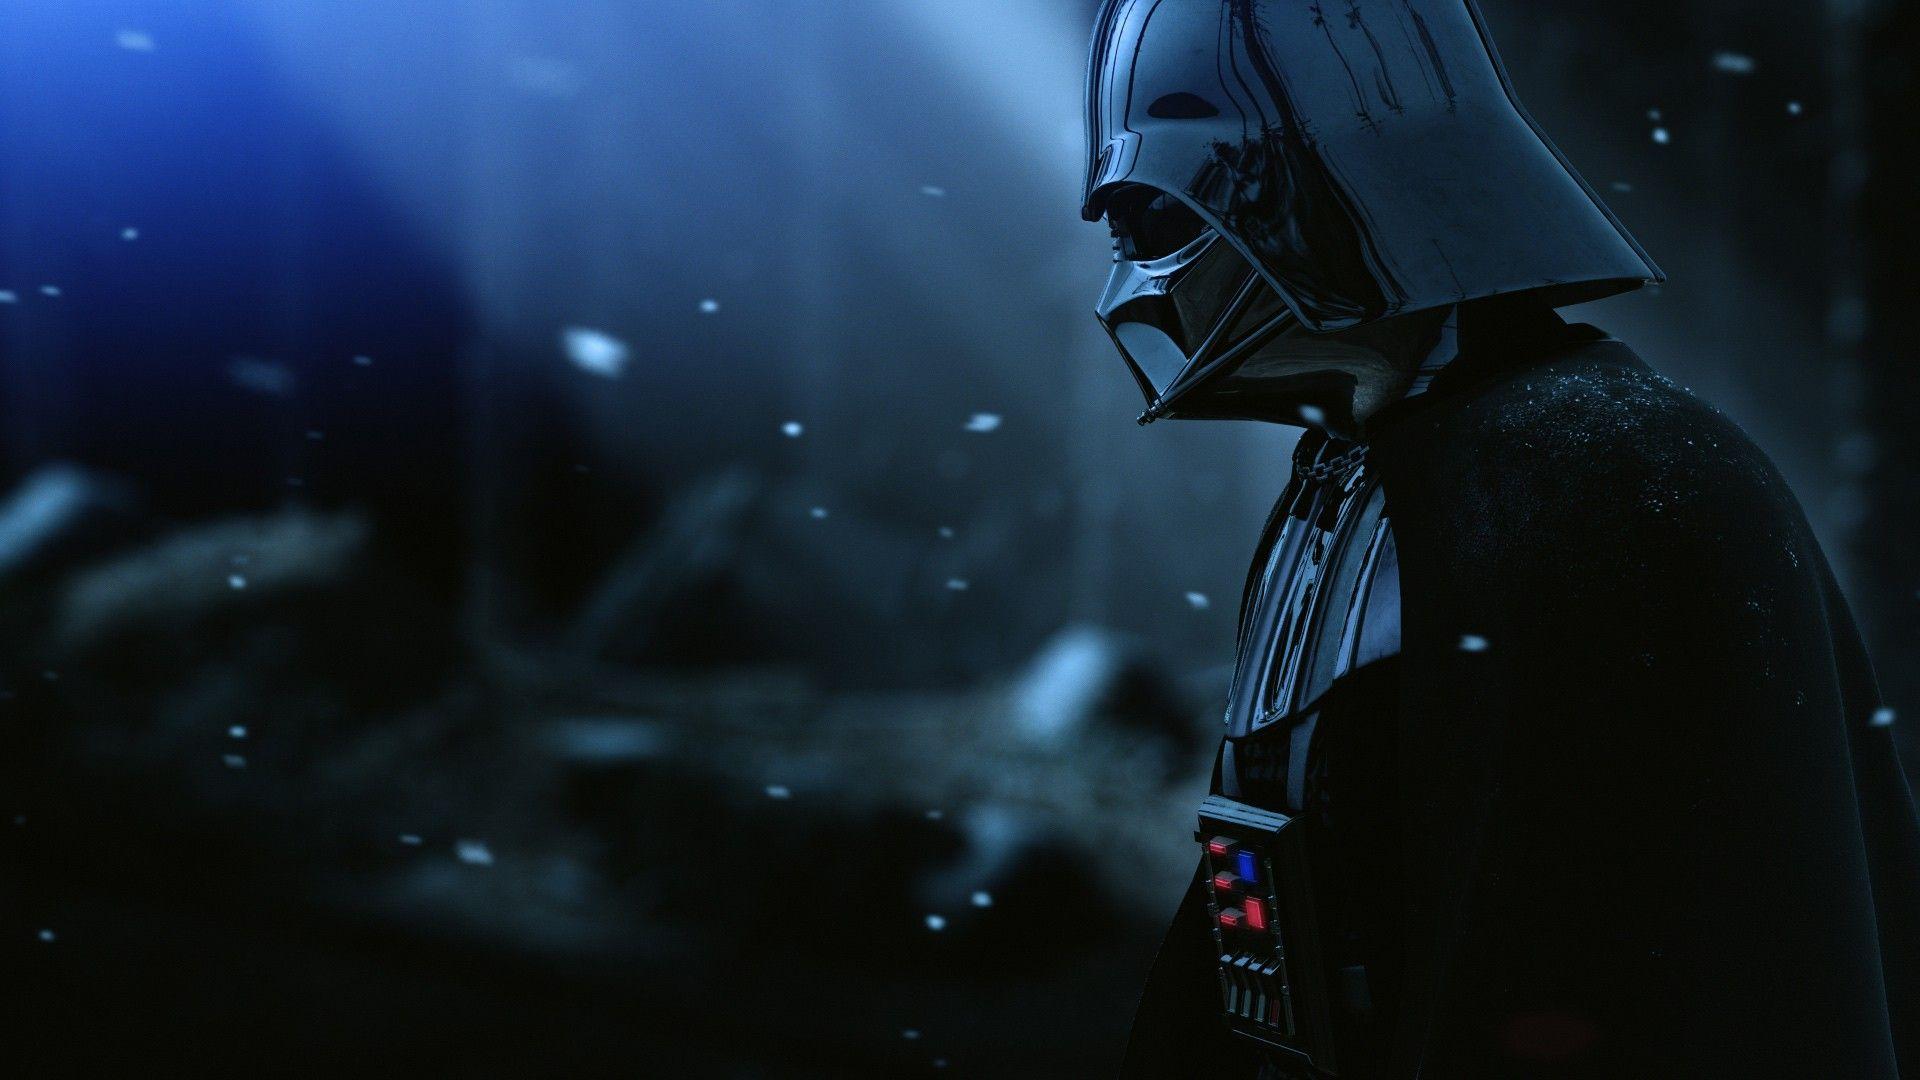 star wars - google search | star wars | pinterest | darth vader